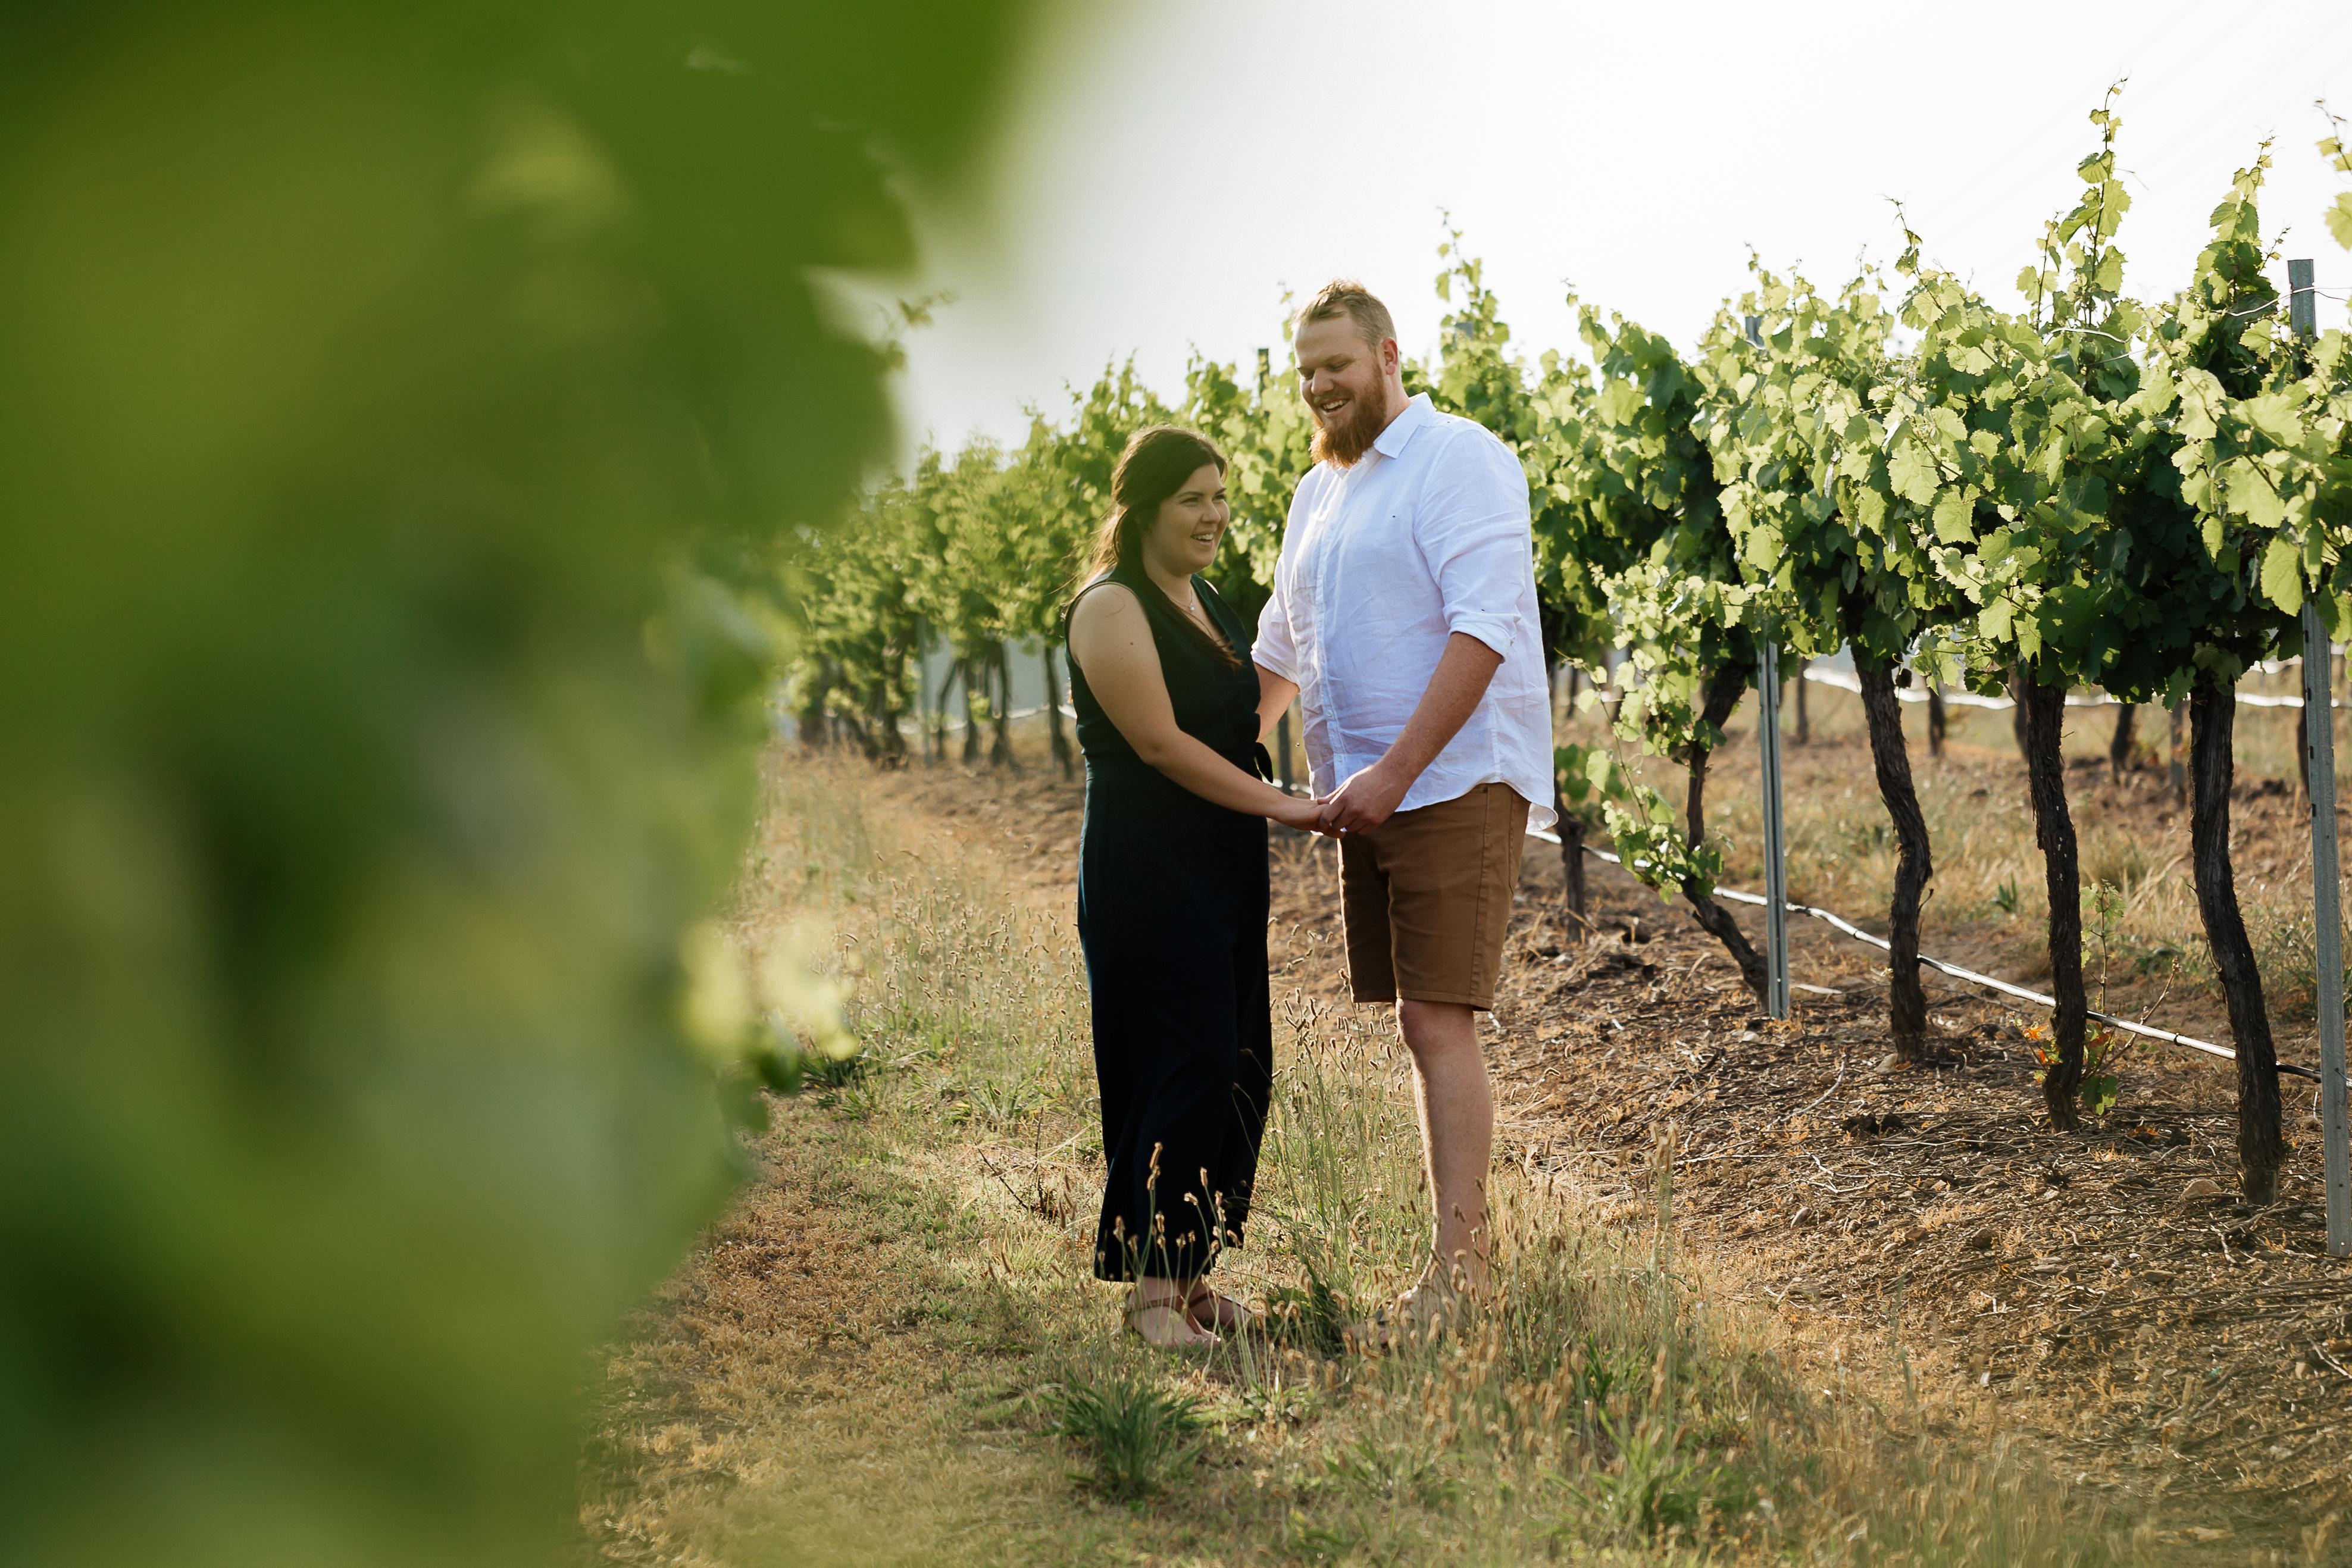 Courtney-Black-Hunter-Valley-Engagement-8465